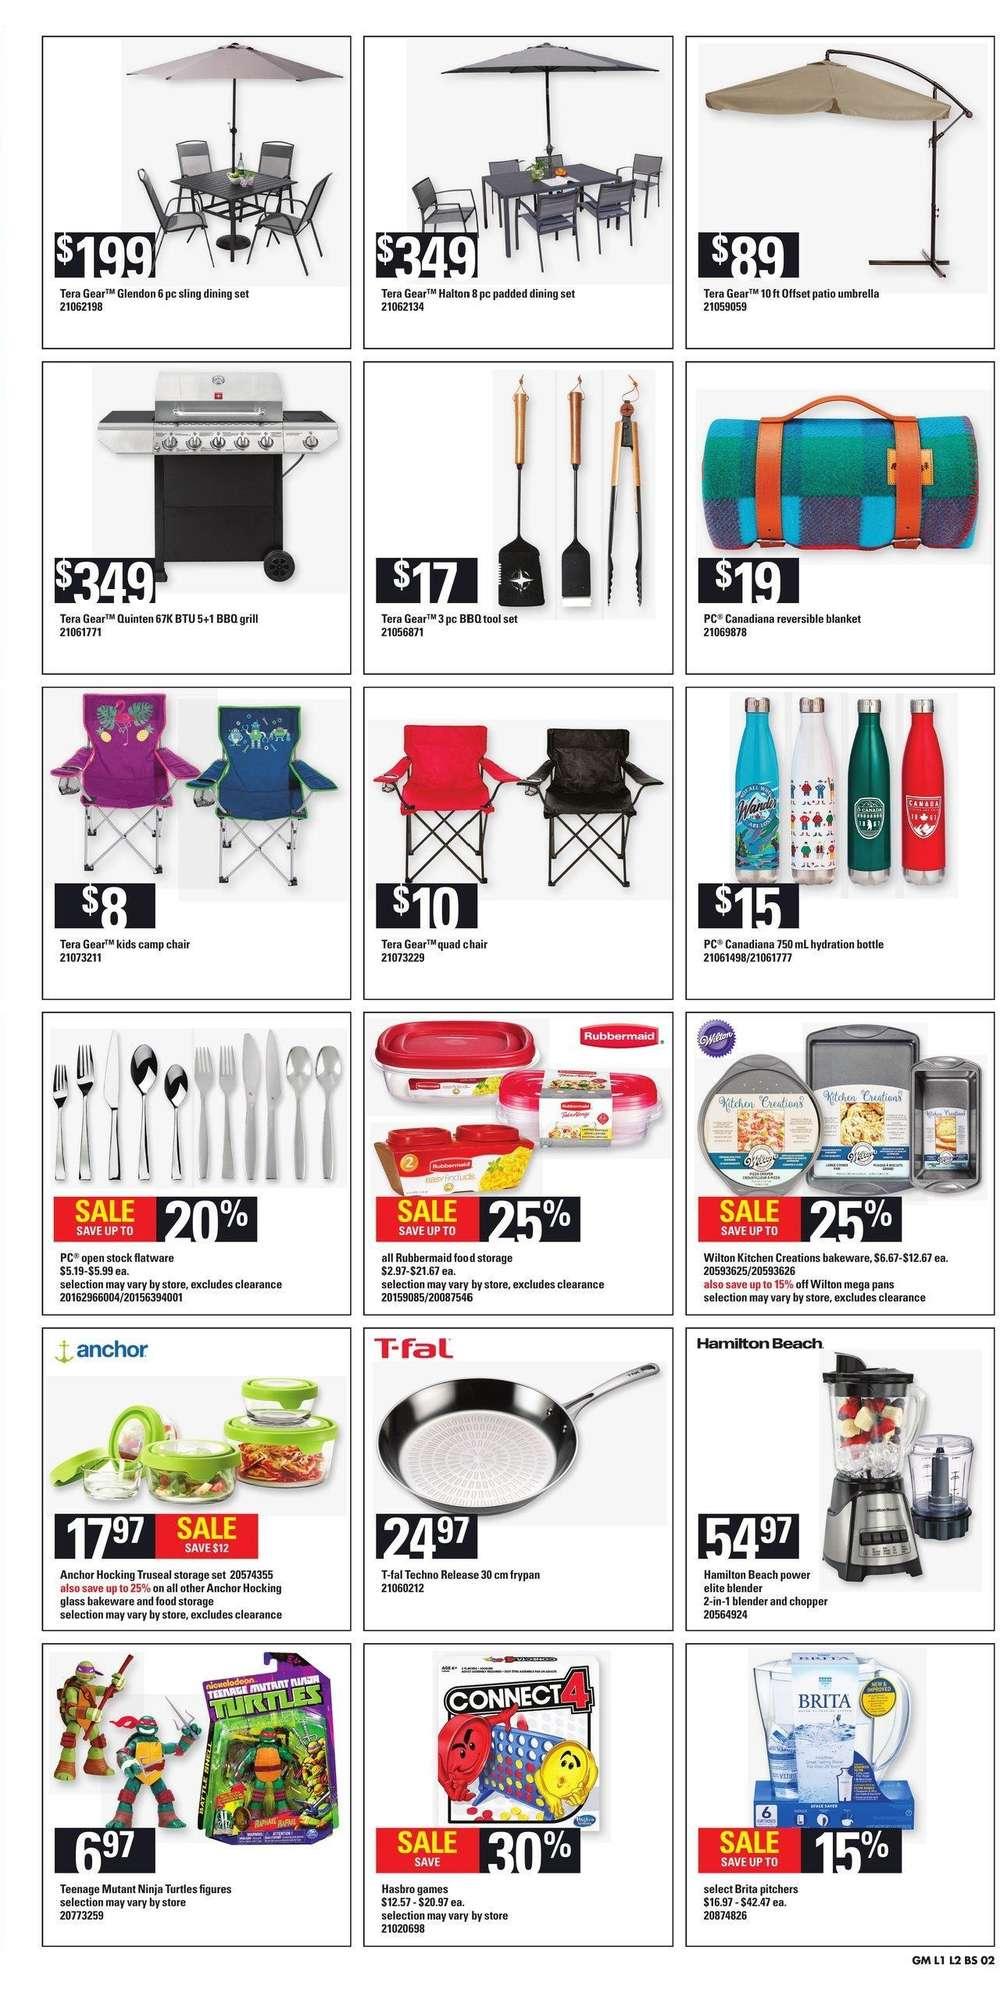 Loblaws logo clipart clip art stock Loblaws Flyer (ON) June 14 - 20 2018 clip art stock